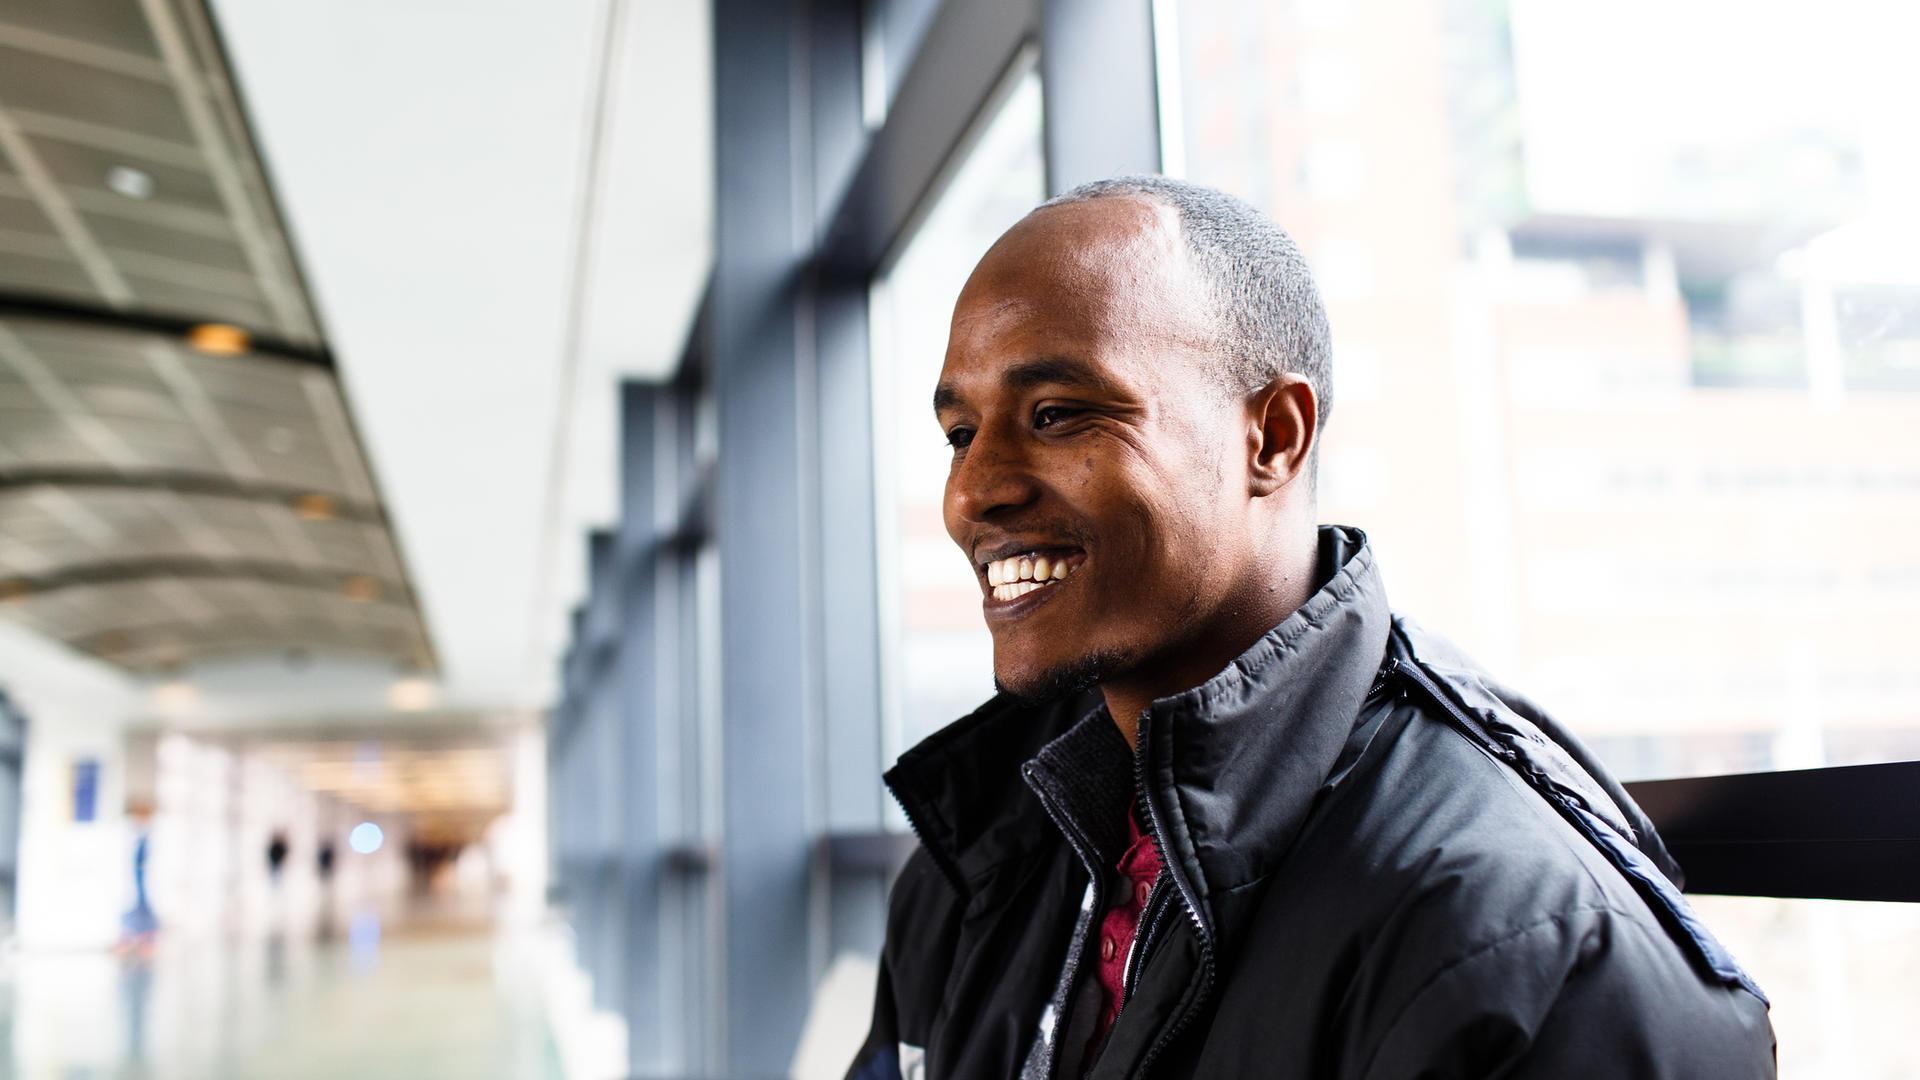 Mulu Bahre poses at John Hopkins Hospital in Baltimore